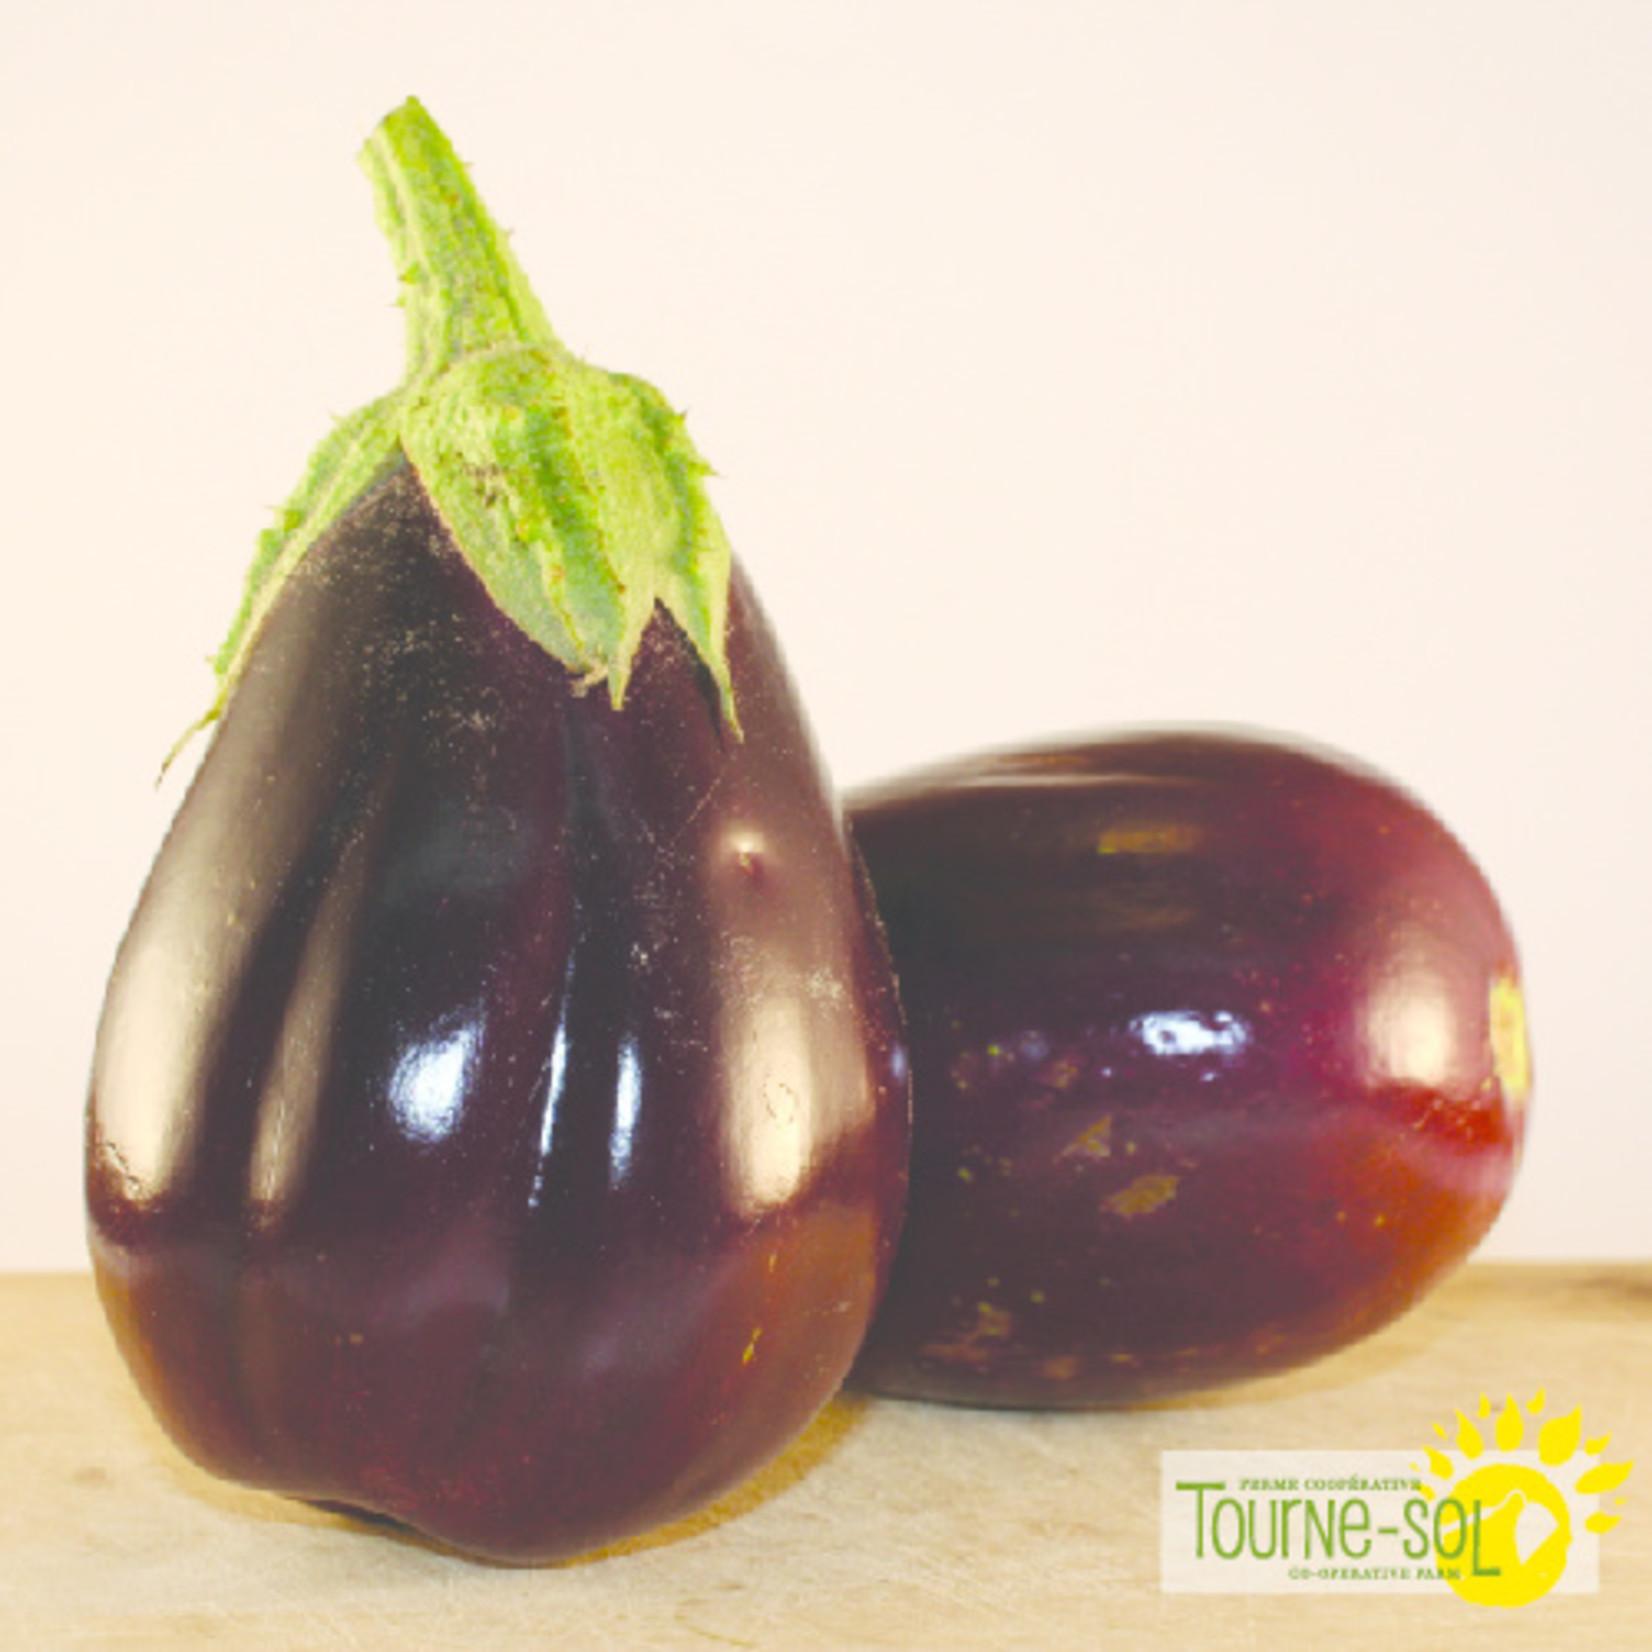 Tourne-Sol Aubergine Black Beauty